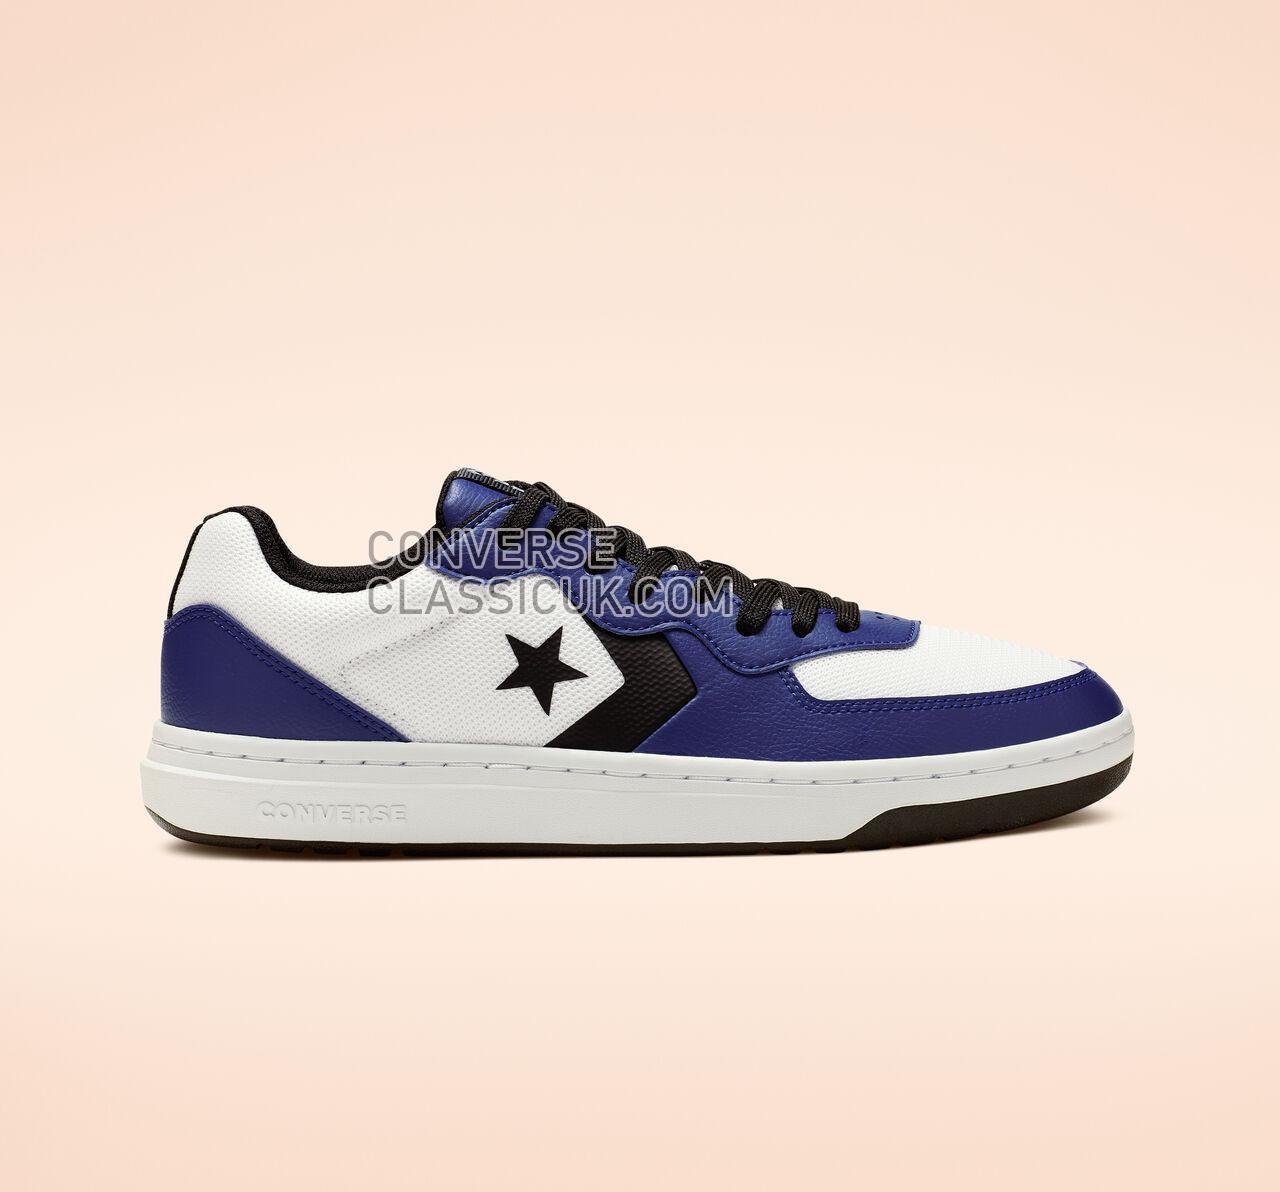 Converse Rival Low Top Mens Womens Unisex 164894C White/Blue/White Shoes